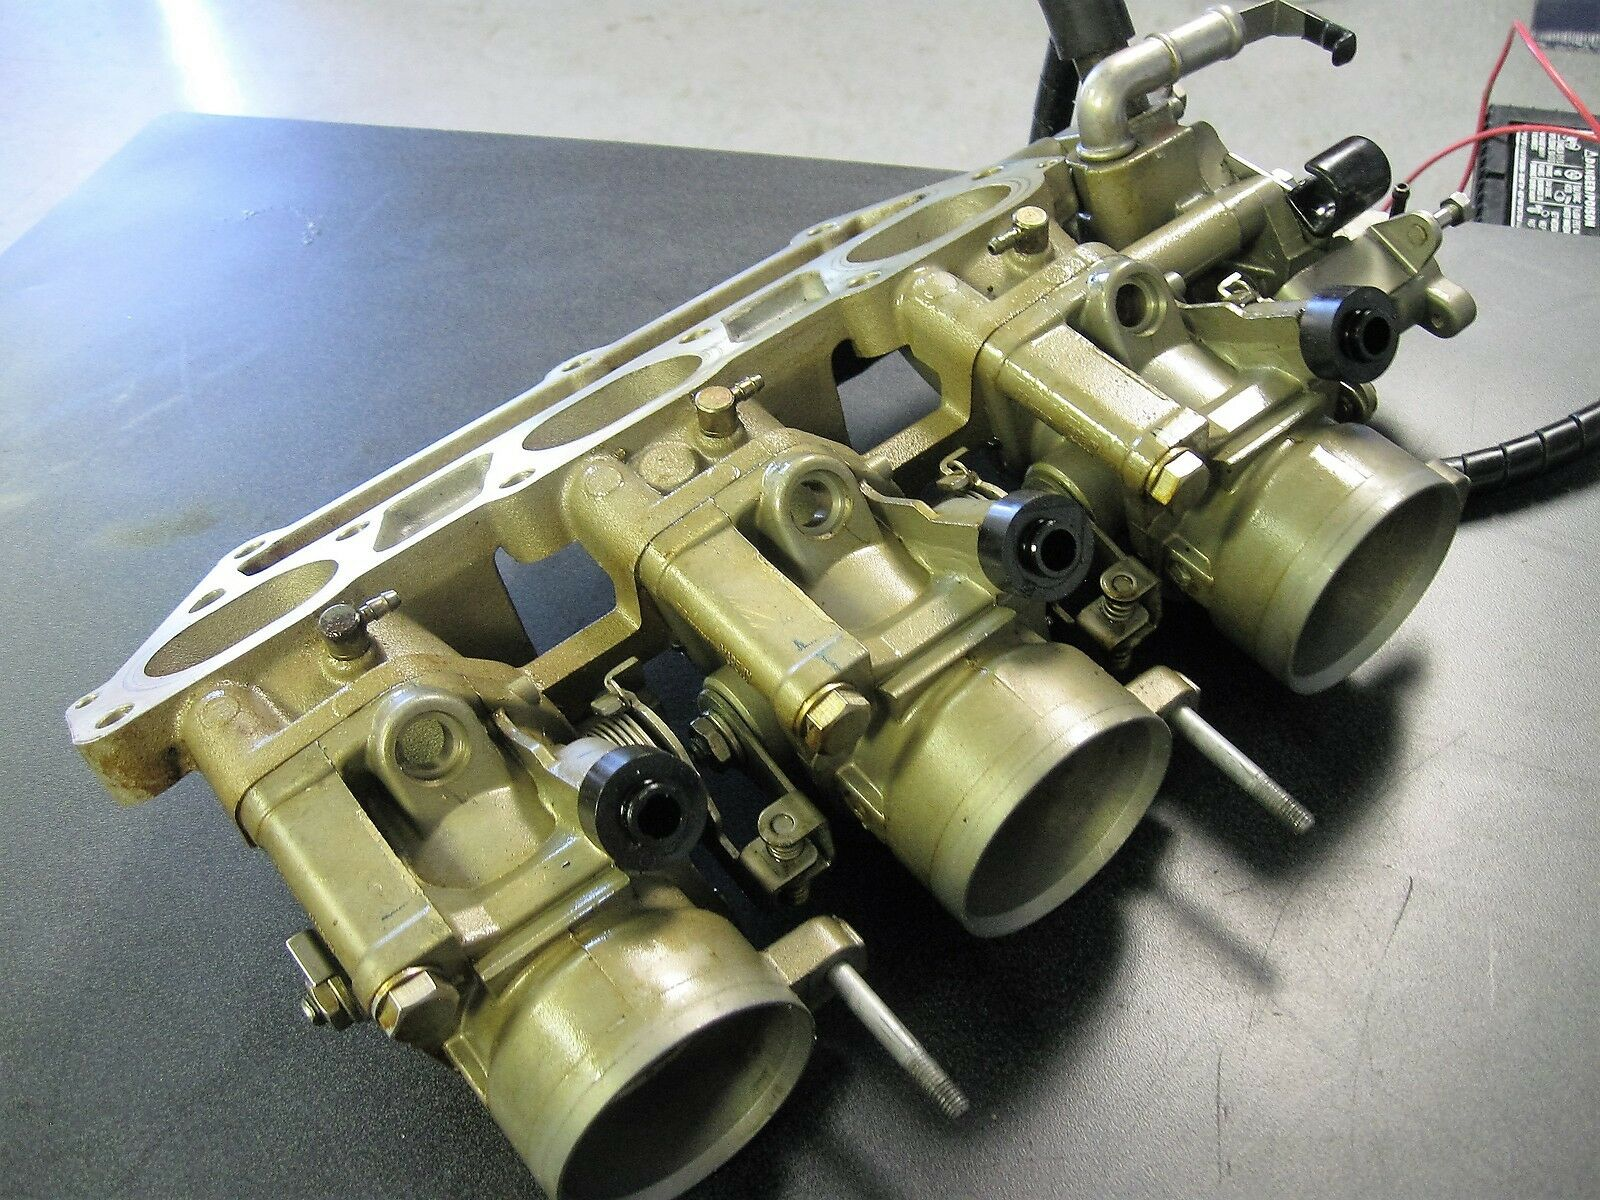 Yamaha 69J-1375A-11-00 Außenborder F225 Drosselklappengehäuse Montage 69J-1375A-11-00 Yamaha badbda